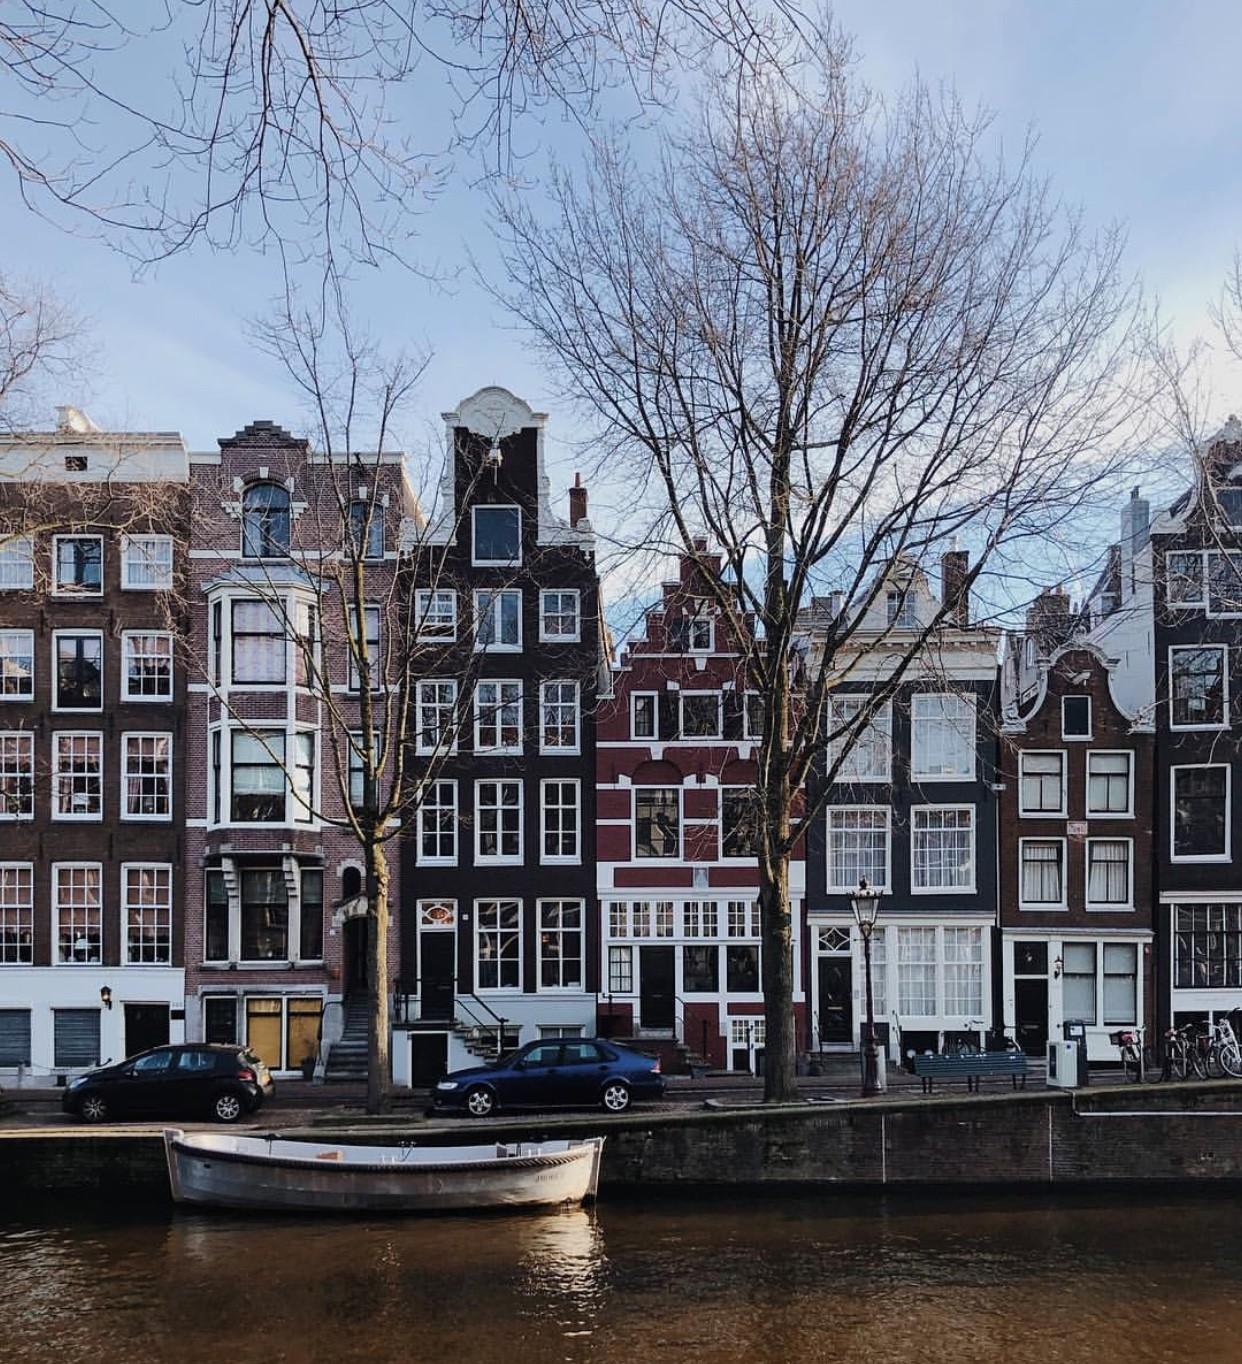 le-dancing-houses-amsterdam-928fd8ca04ad